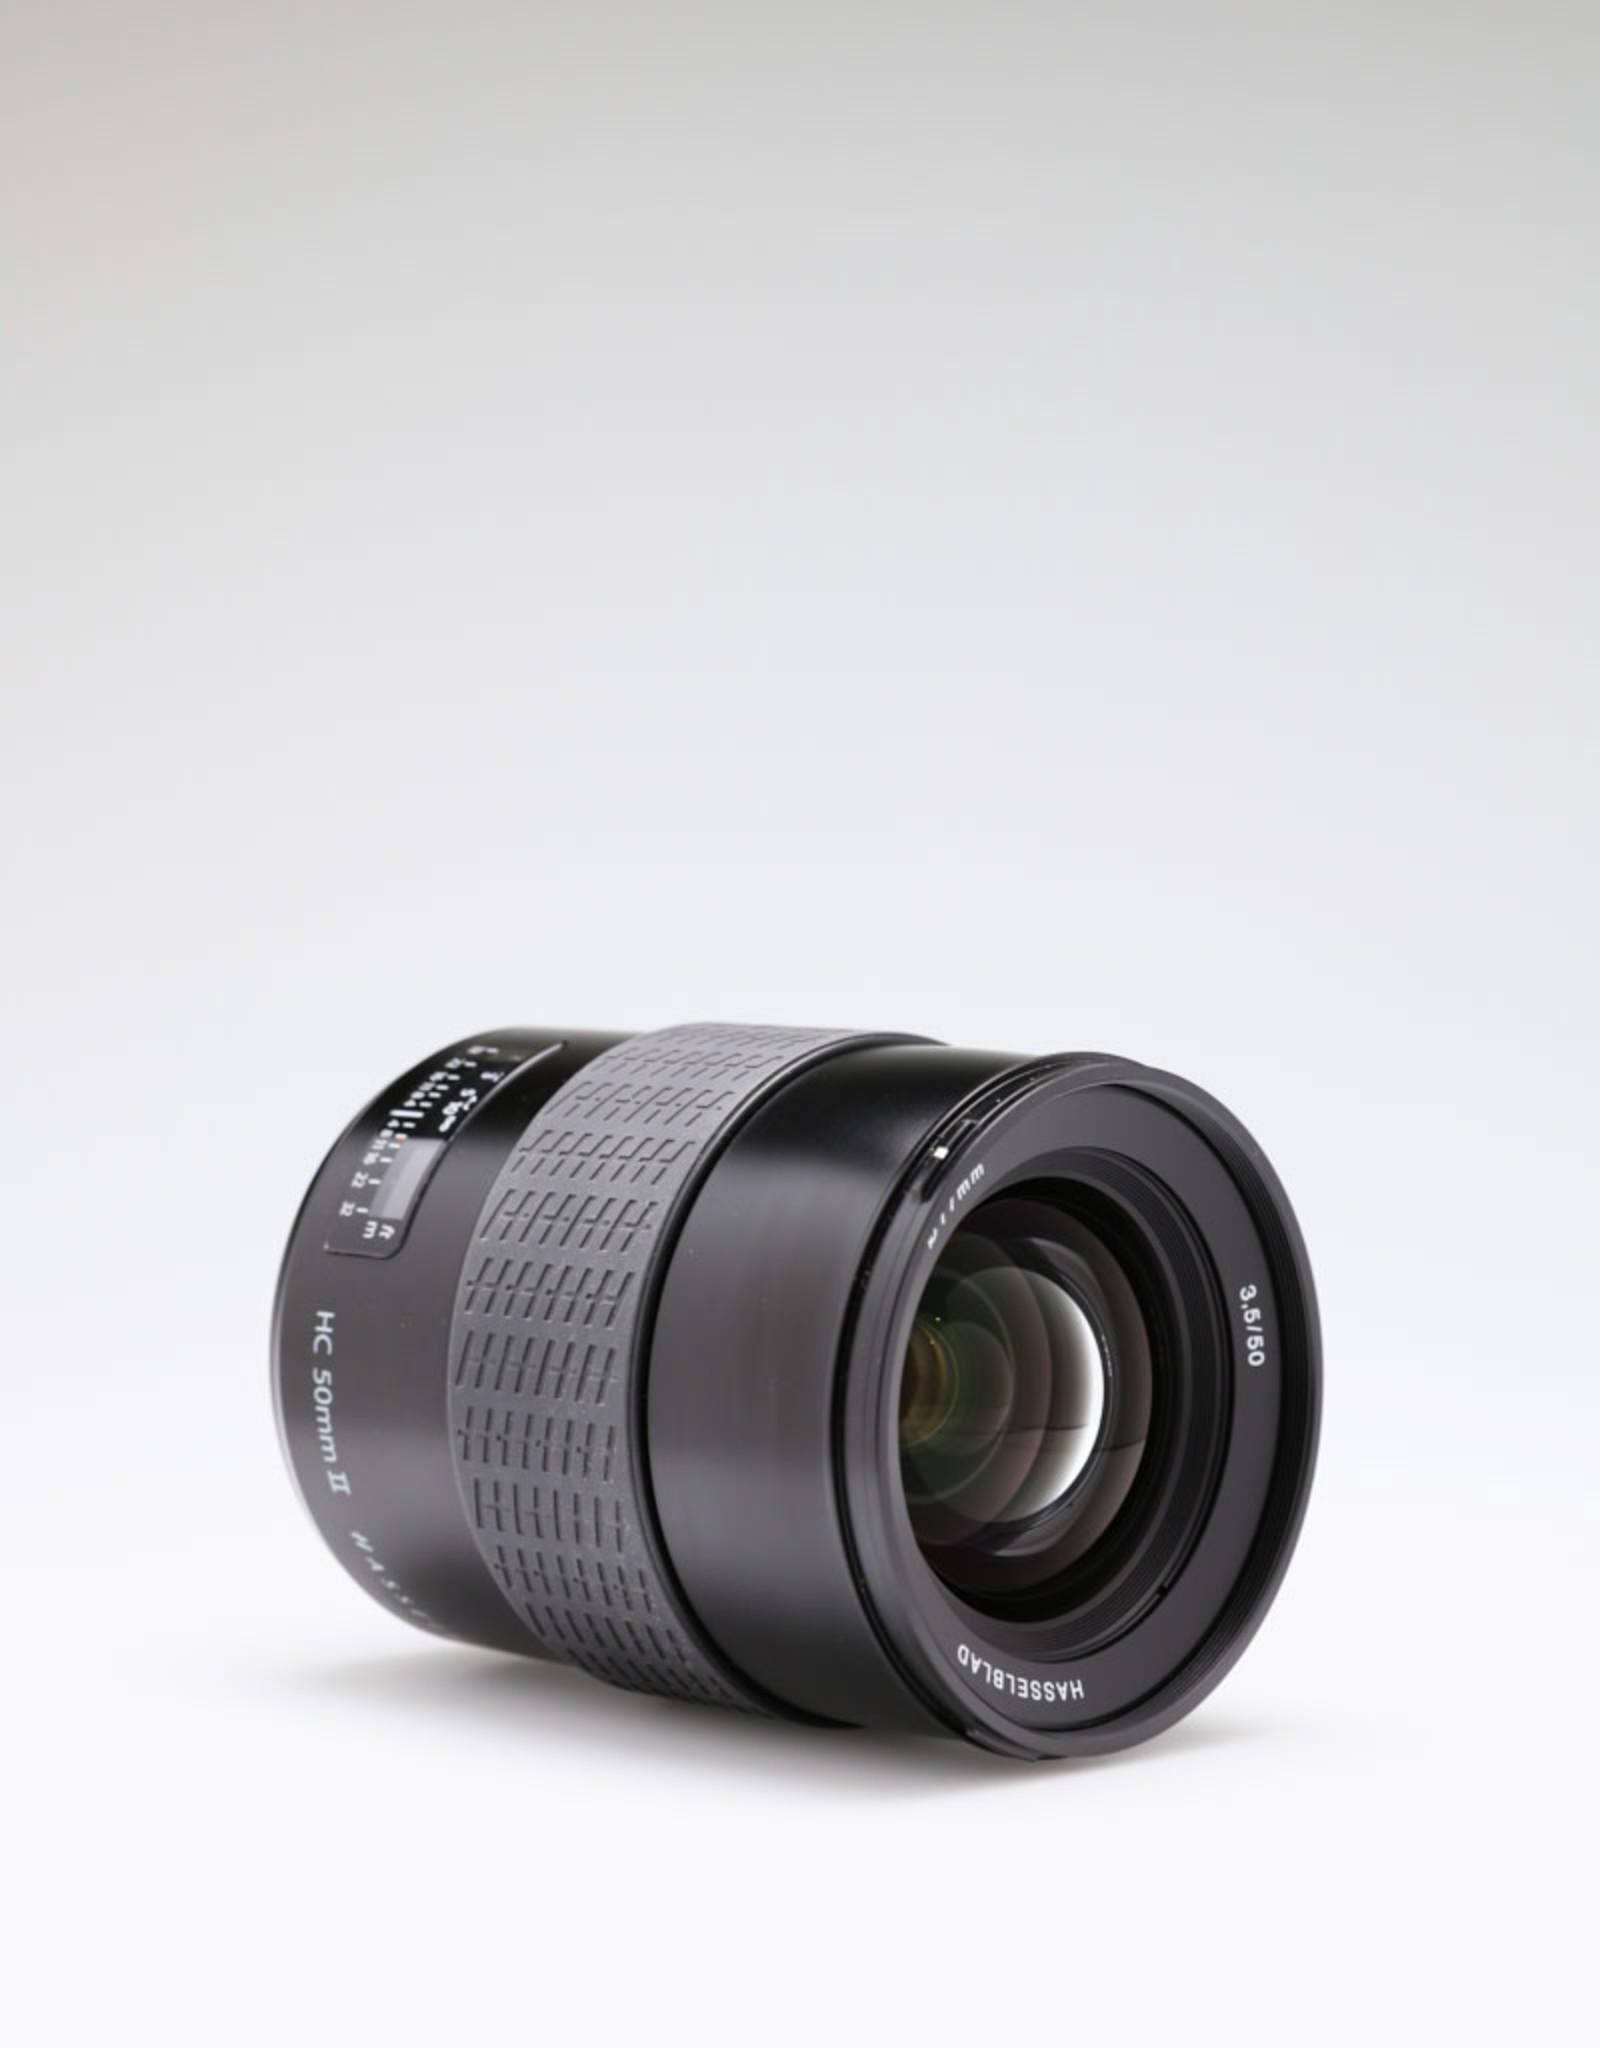 Hasselblad USED  Hasselblad HC 50mm II F3.5 Lens